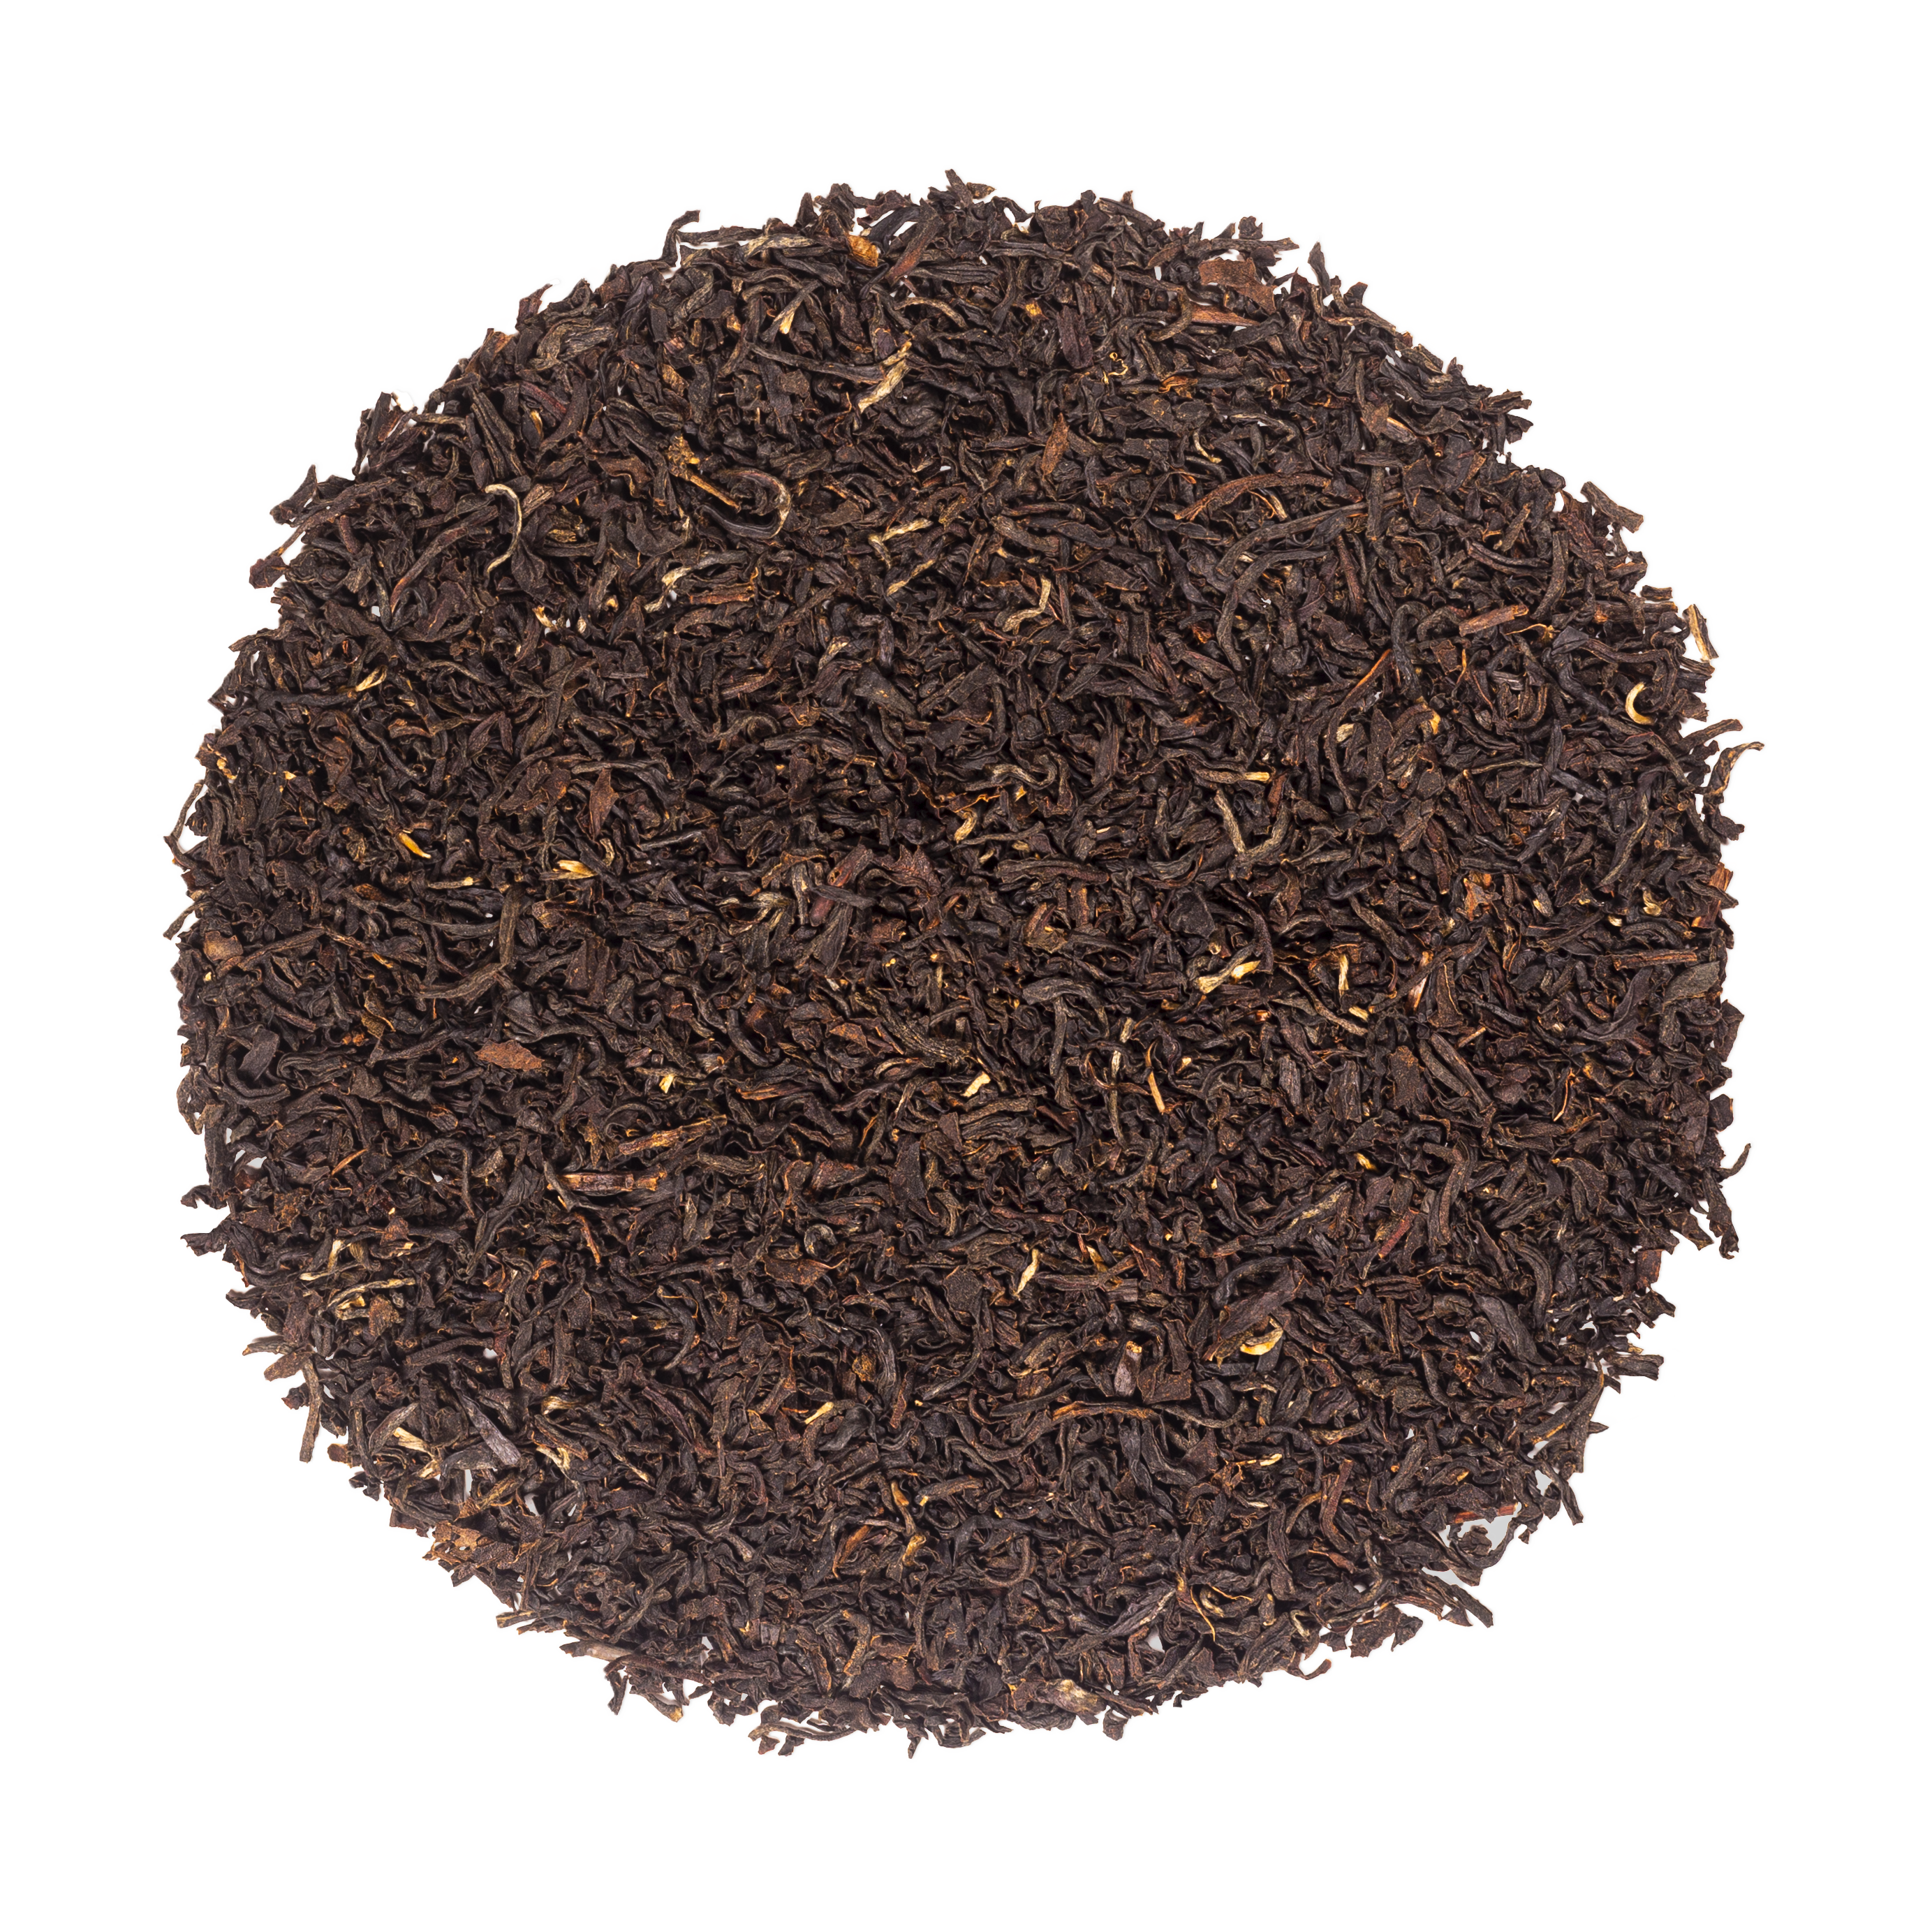 Thé noir - Assam bio - Vrac - Kusmi Tea